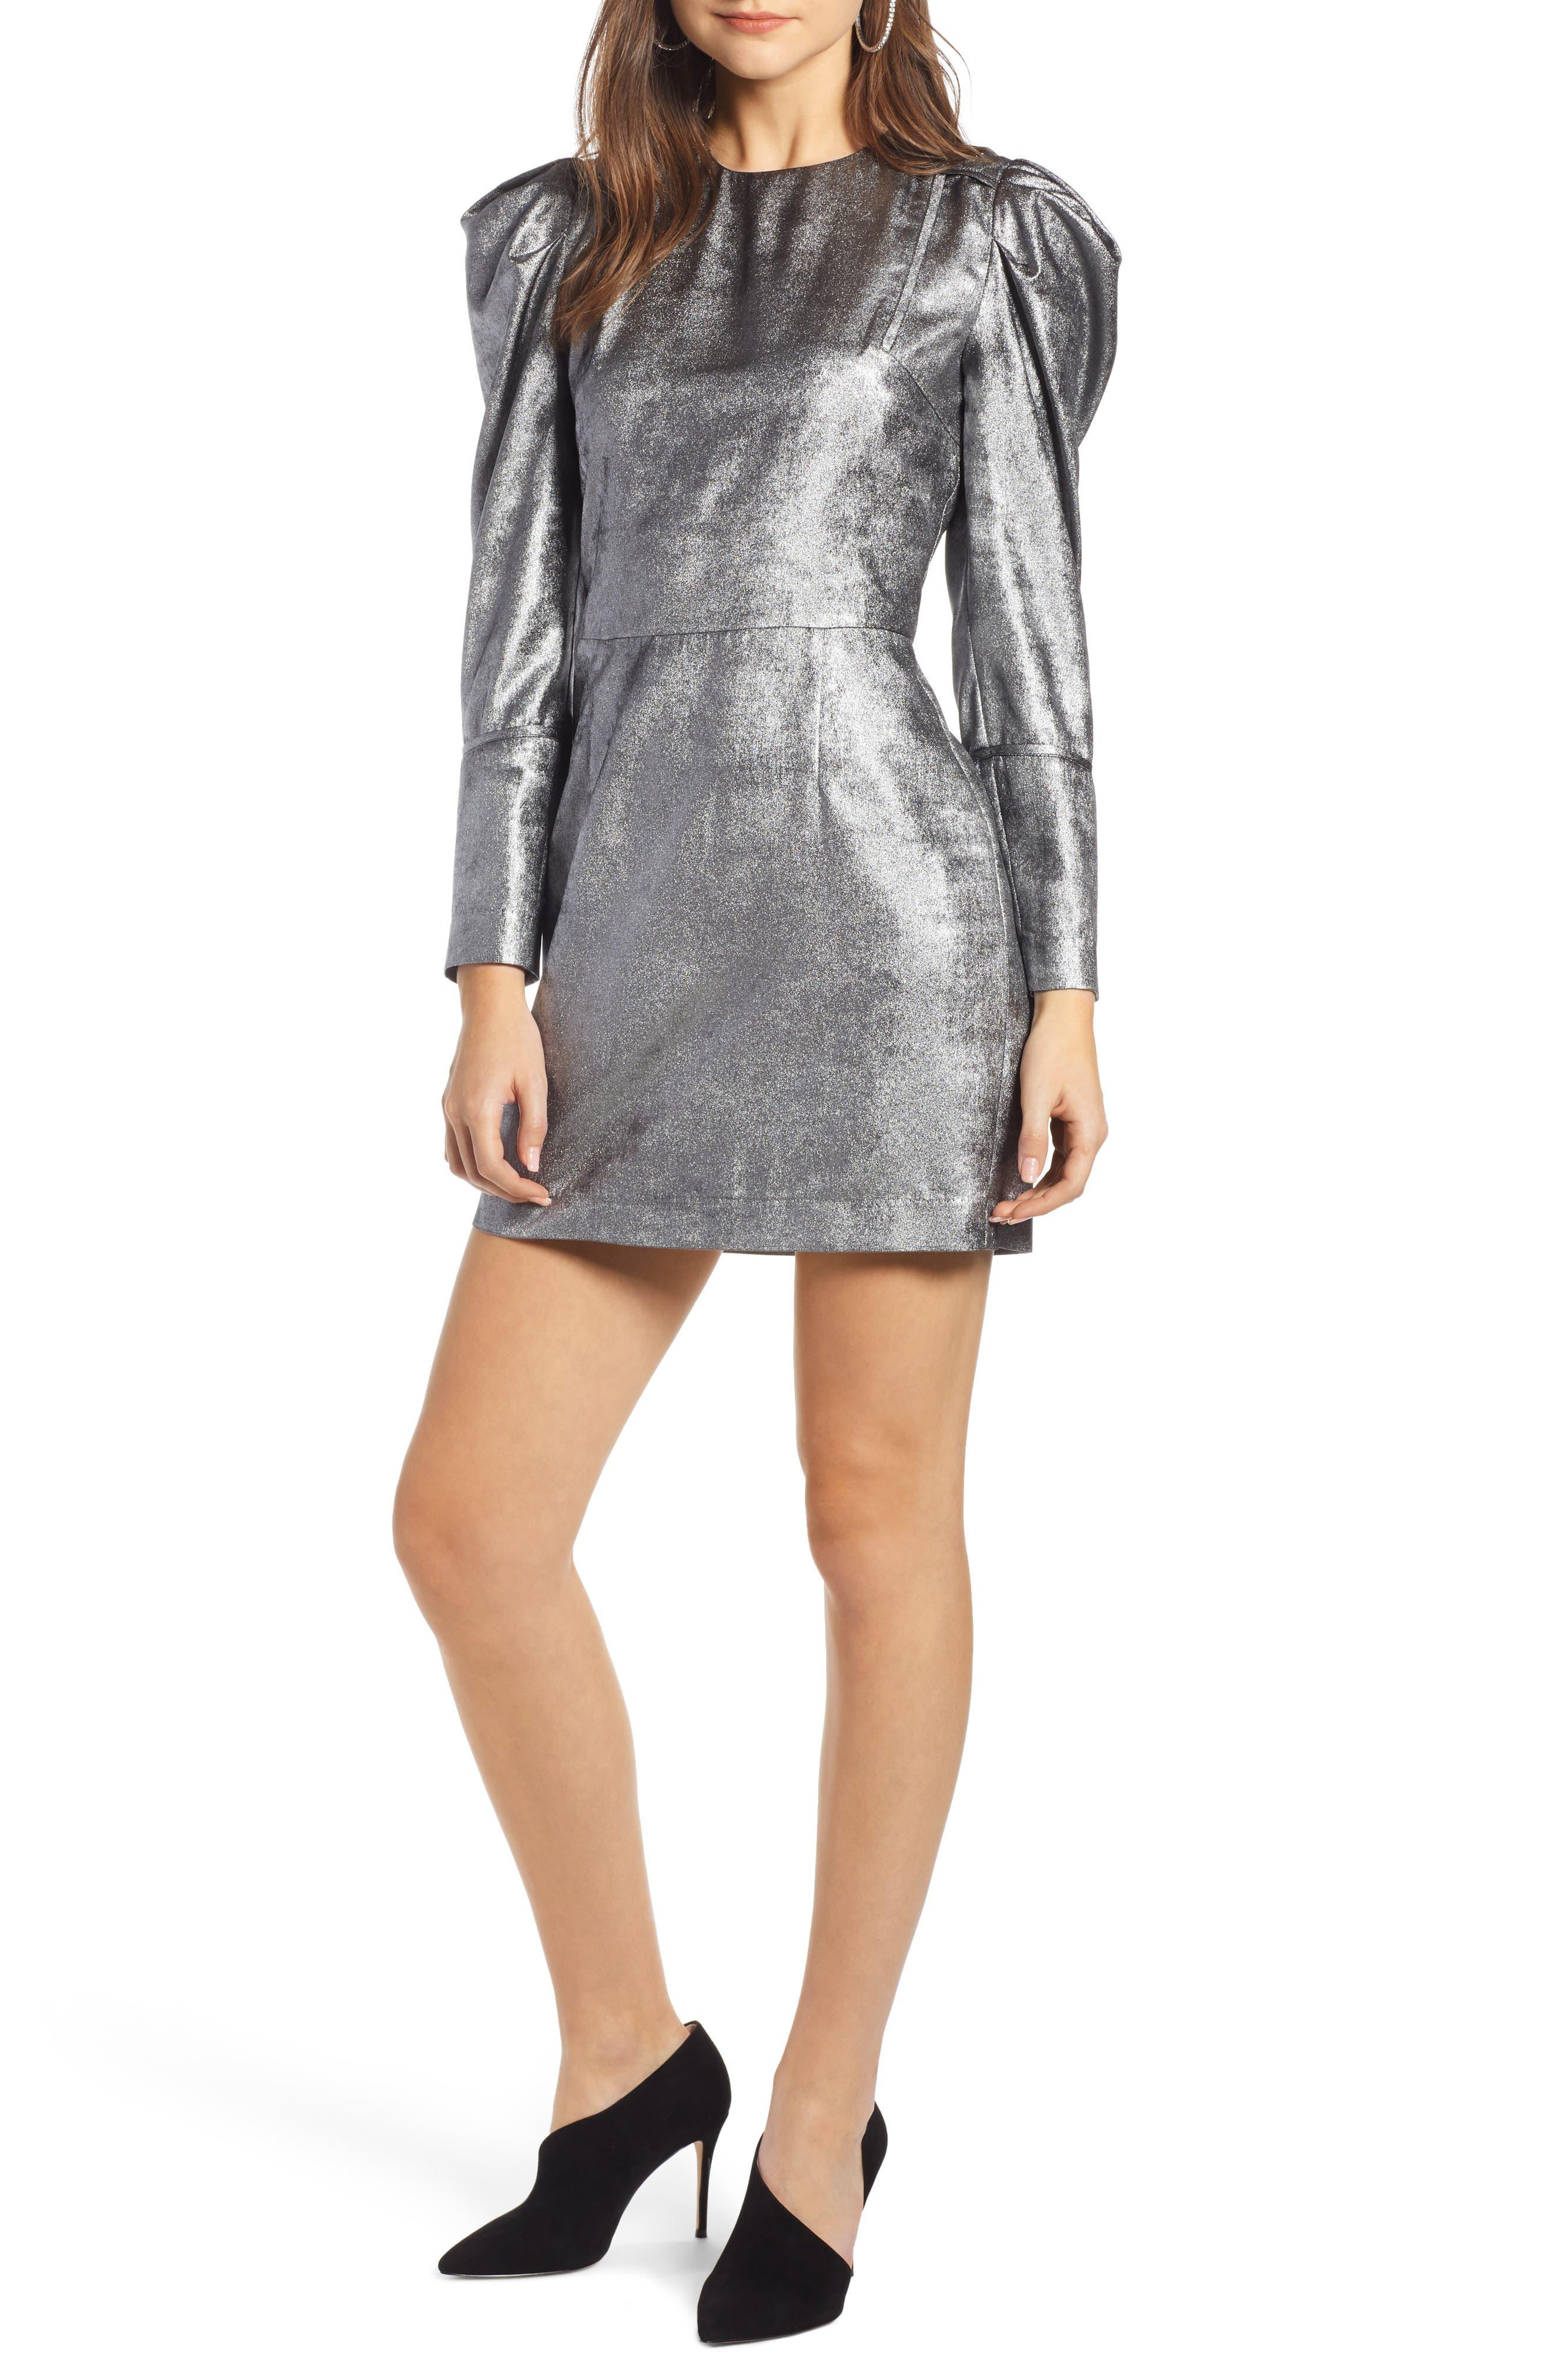 SOMETHING NAVY Foil Minidress, Main, color, 040